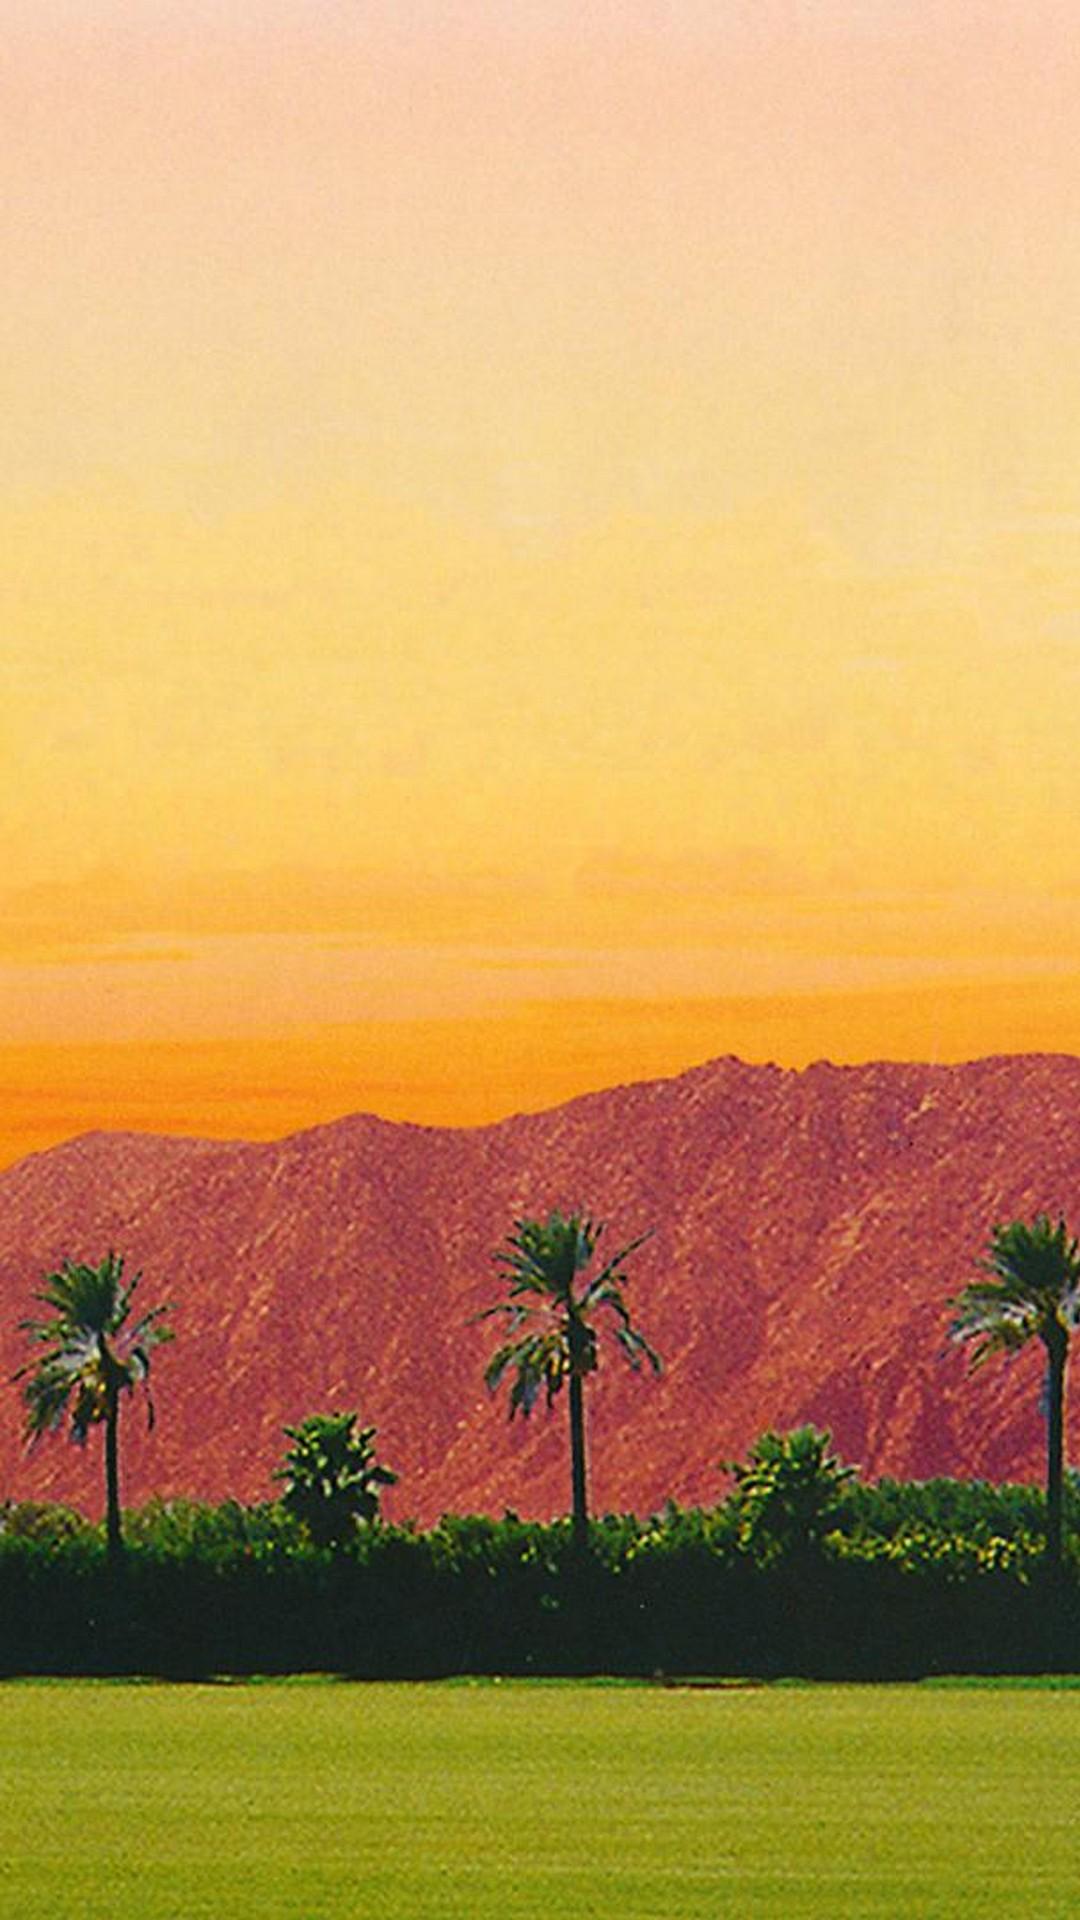 Coachella 2019 Wallpaper For Android